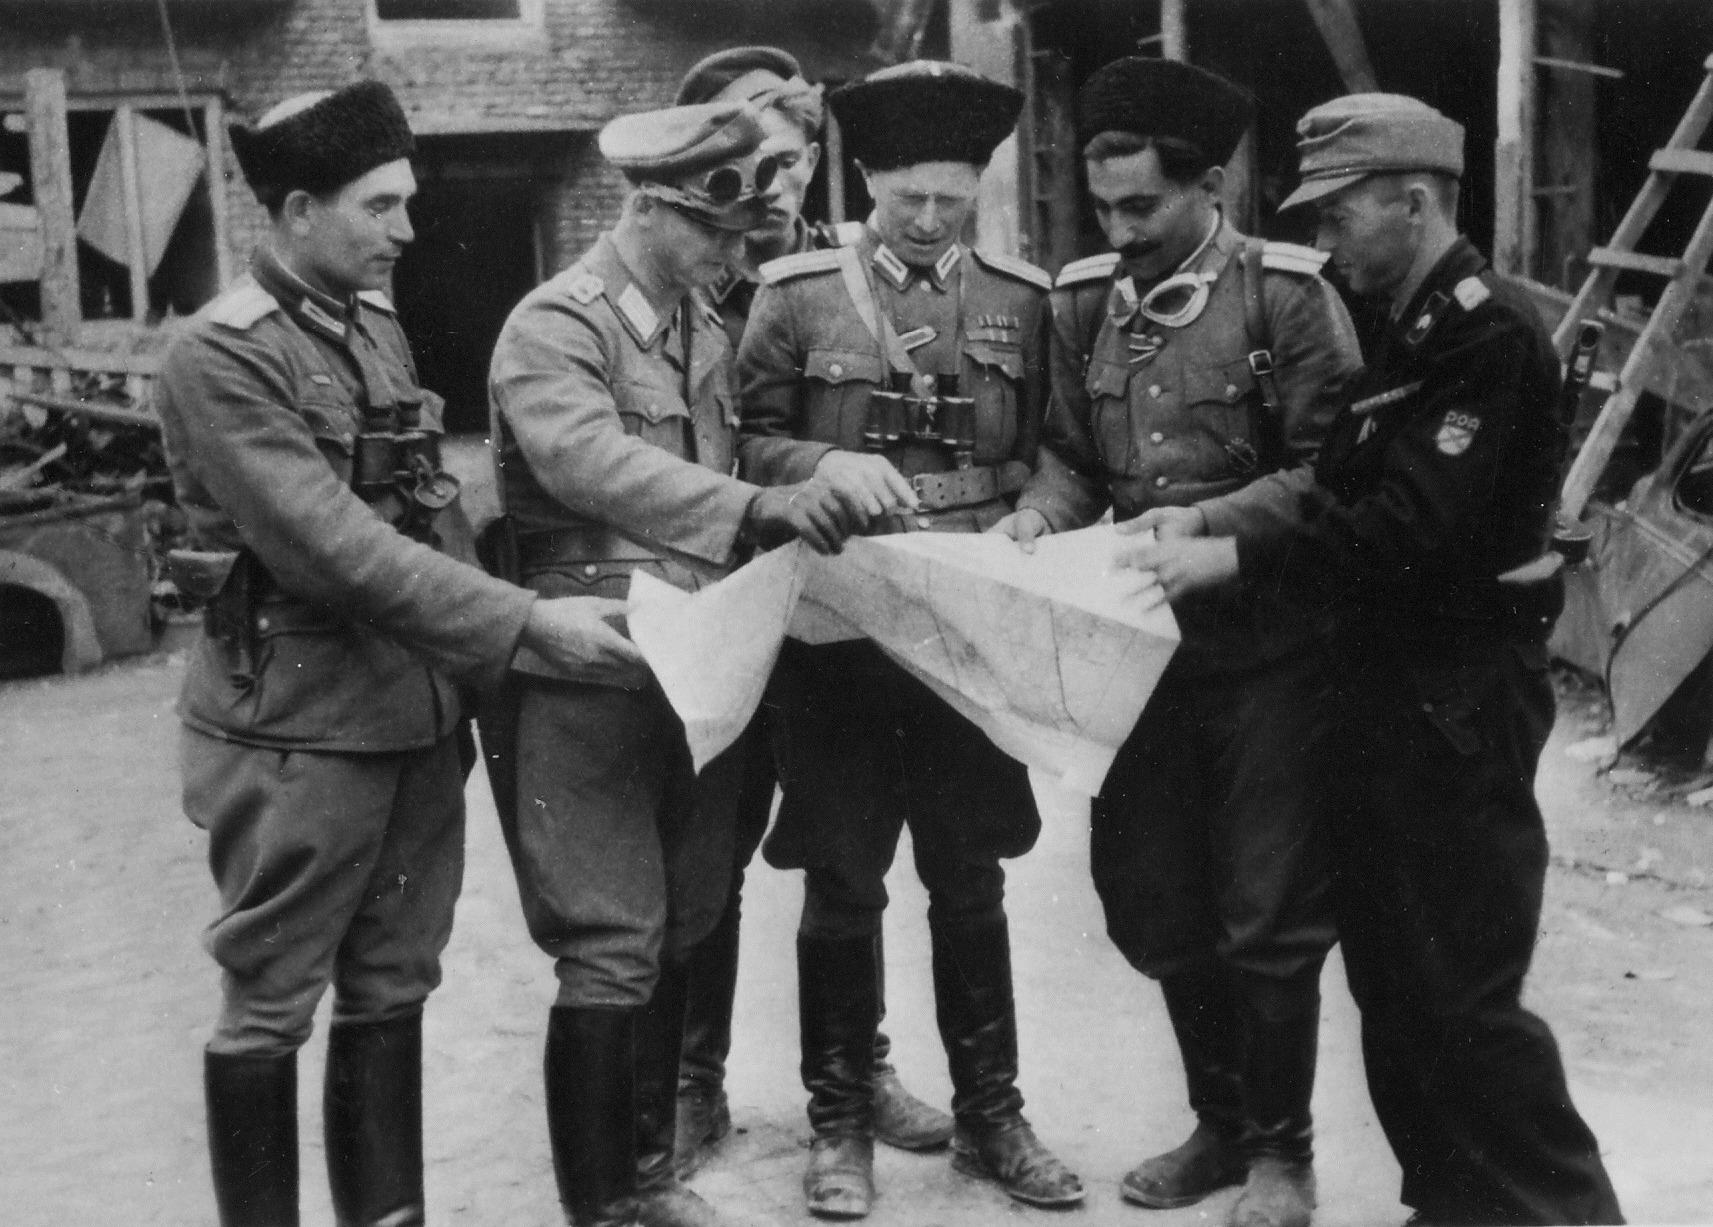 https://upload.wikimedia.org/wikipedia/commons/a/a0/Warsaw_Uprising_-_Kaminski_%281944%29.jpg